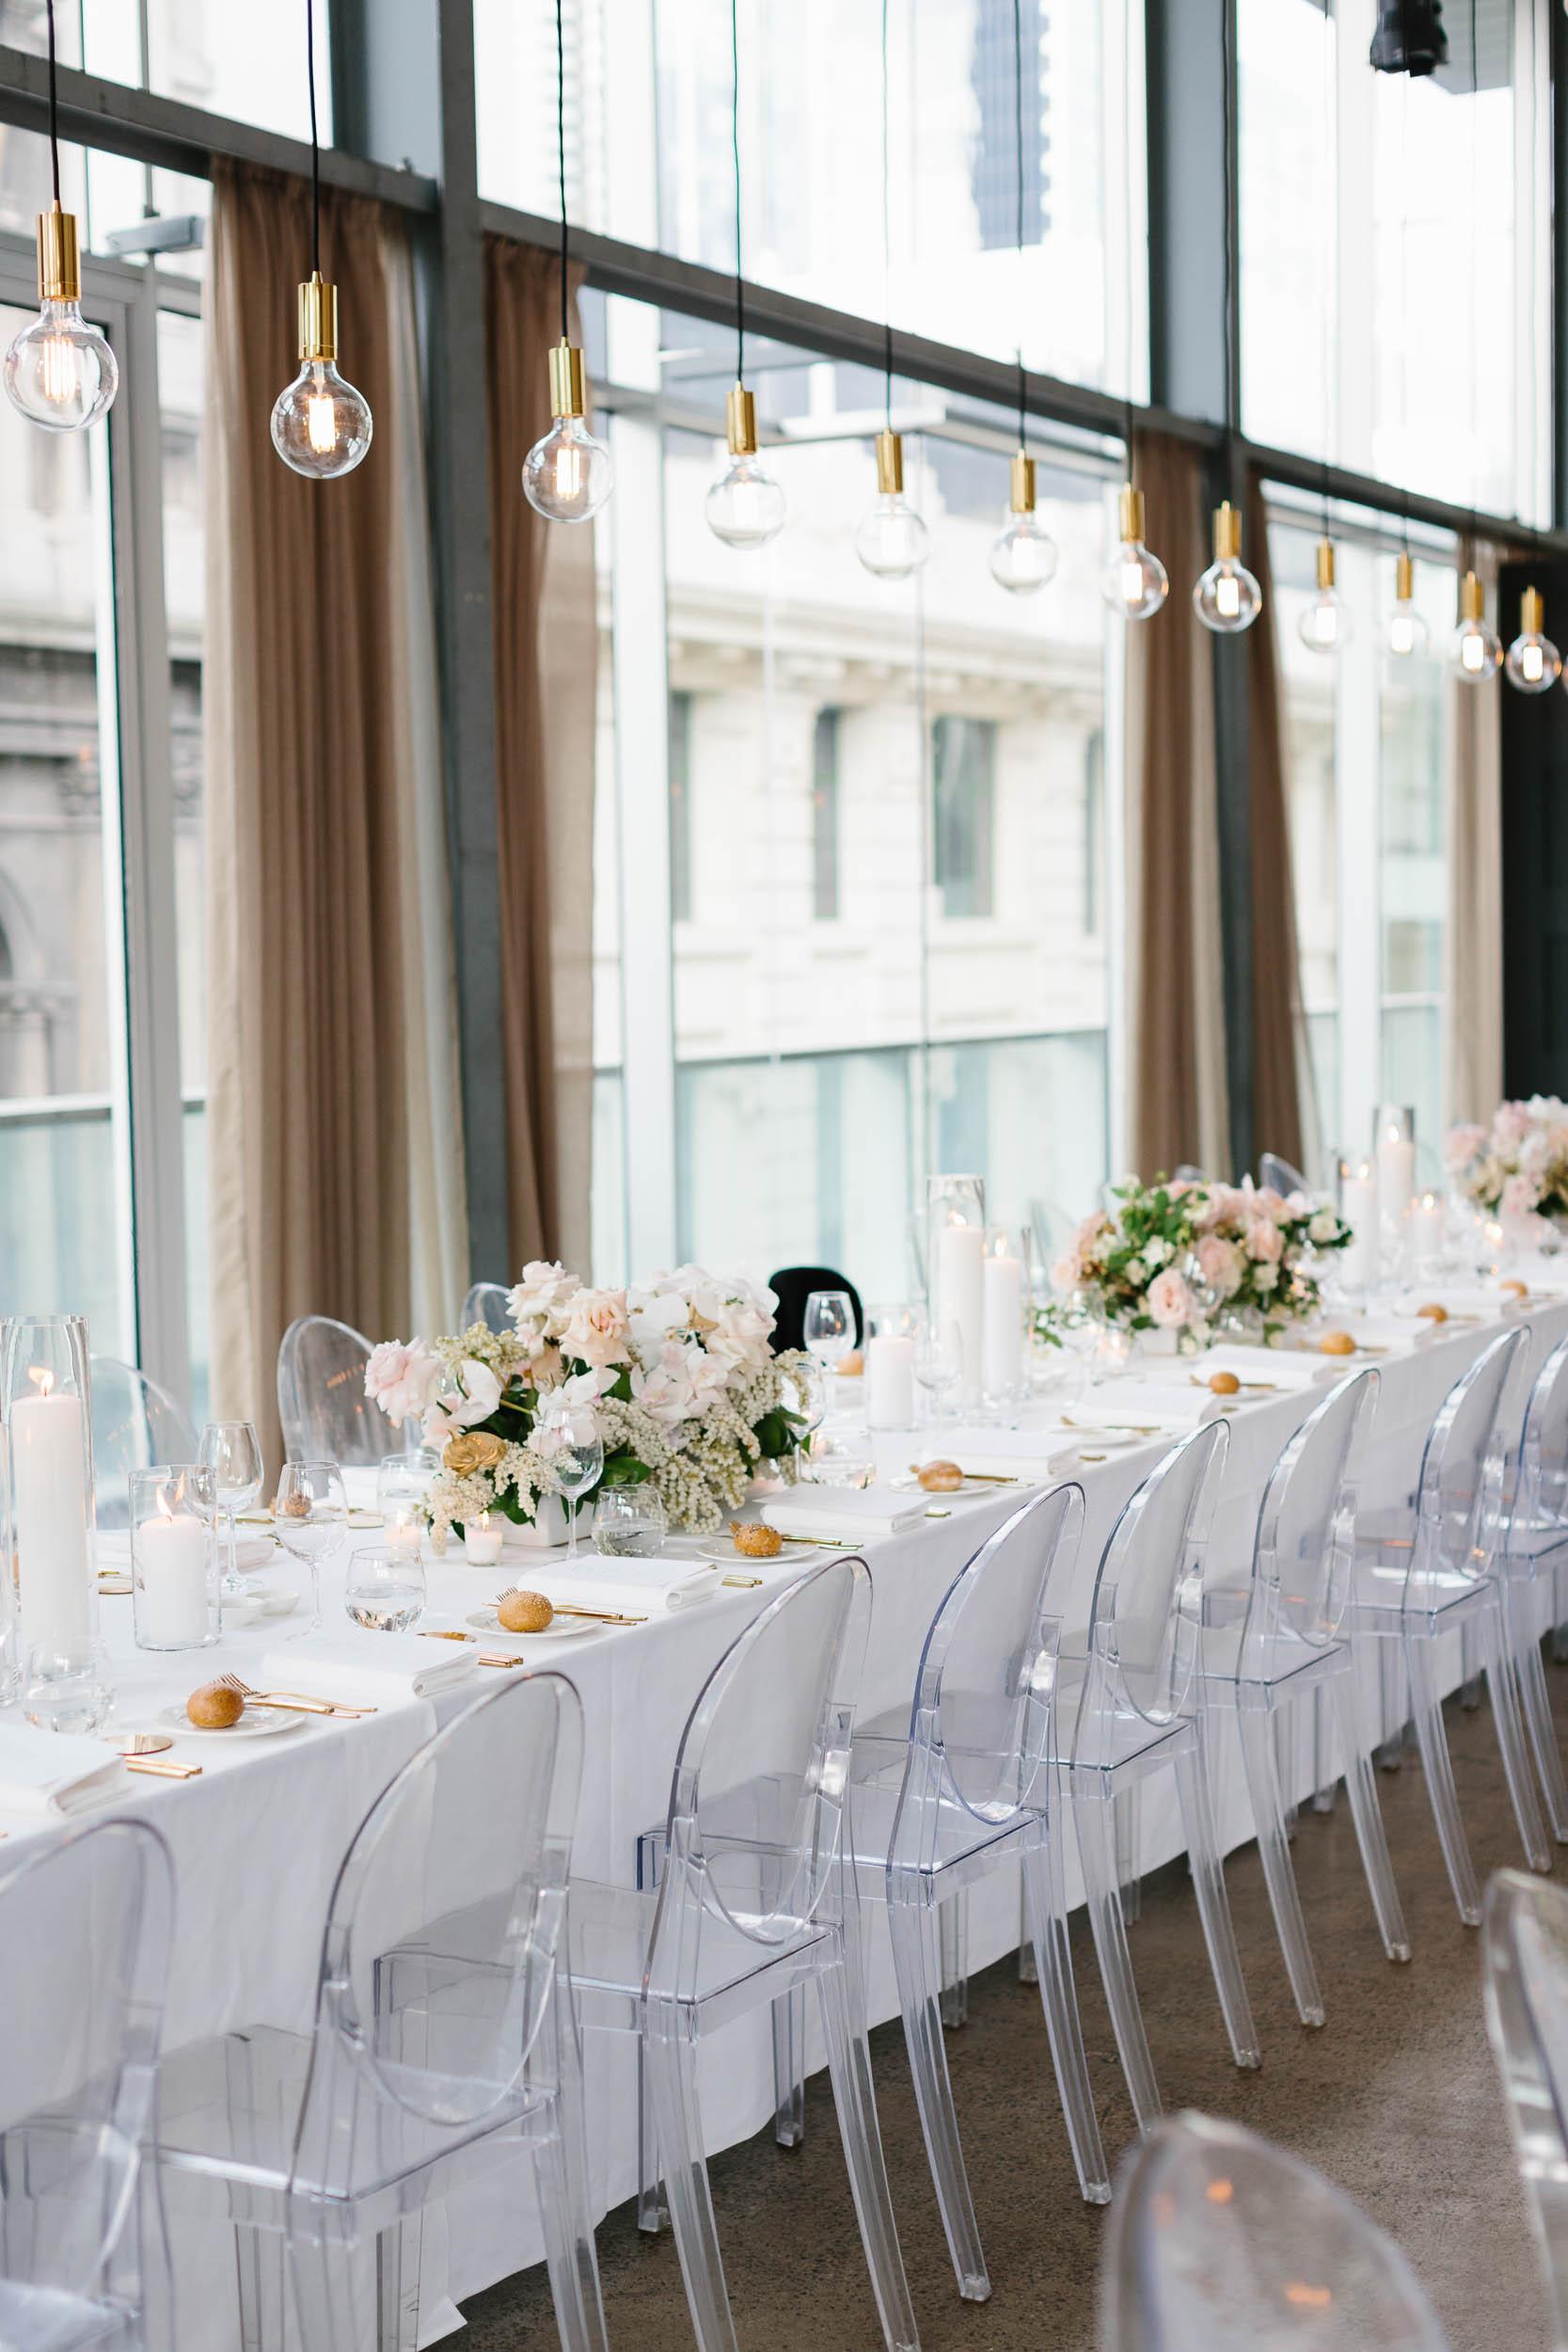 Kas-Richards-Wedding-Photographer-Melbourne-City-Wedding-Alto-Event-Space-Jane-Hill-Bridal-Gown-52.jpg